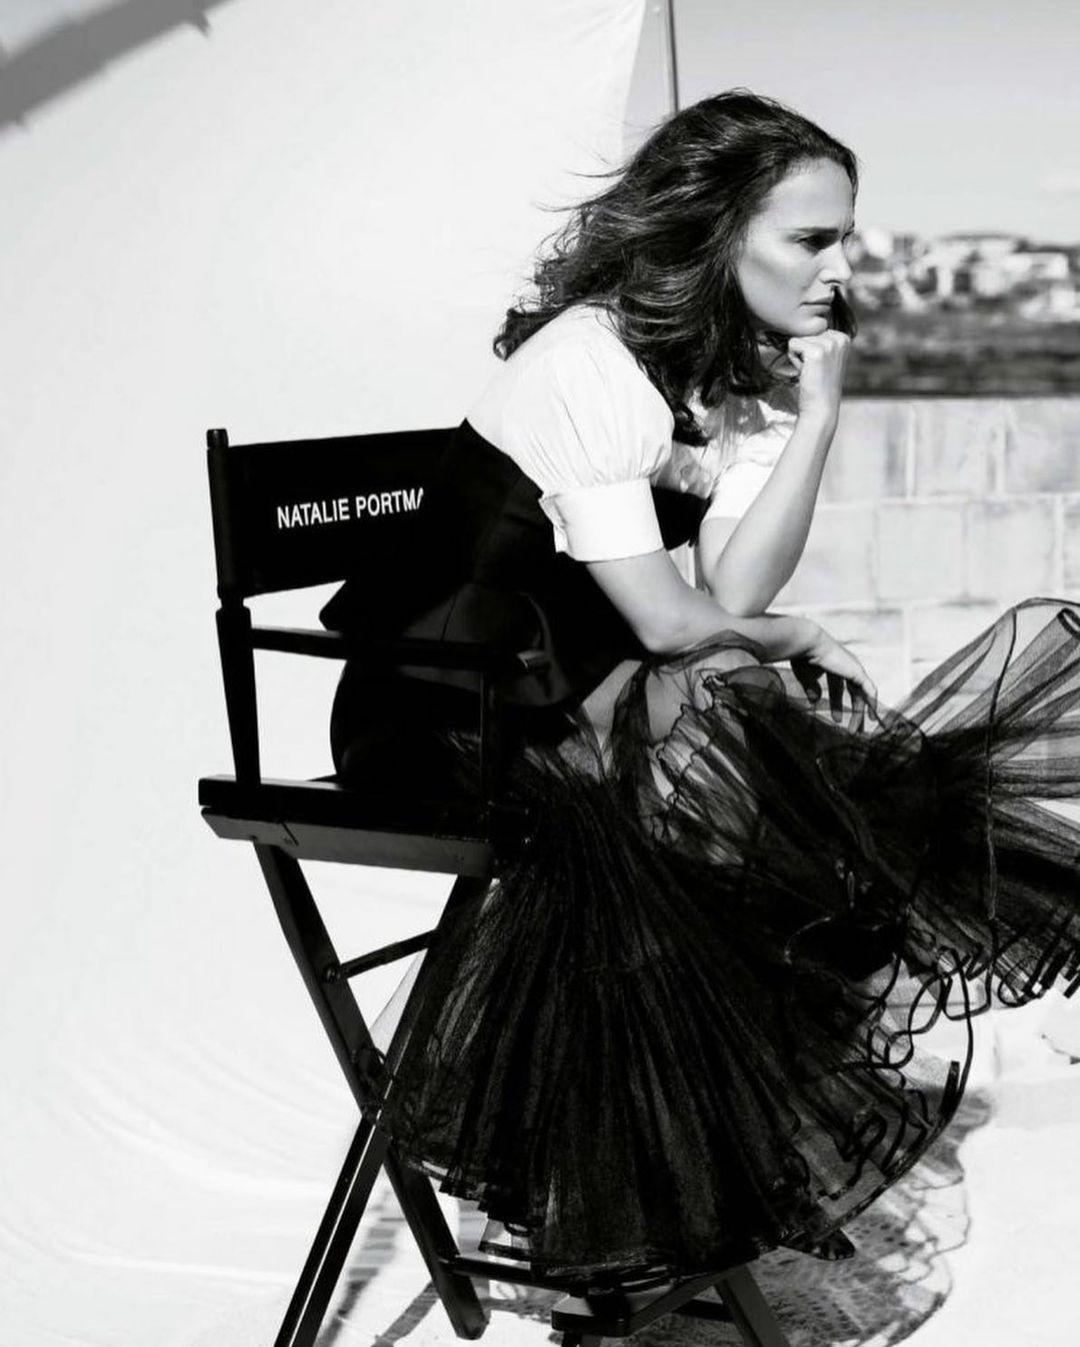 Натали Портман украсила обложку известного глянца (ФОТО) - фото №3